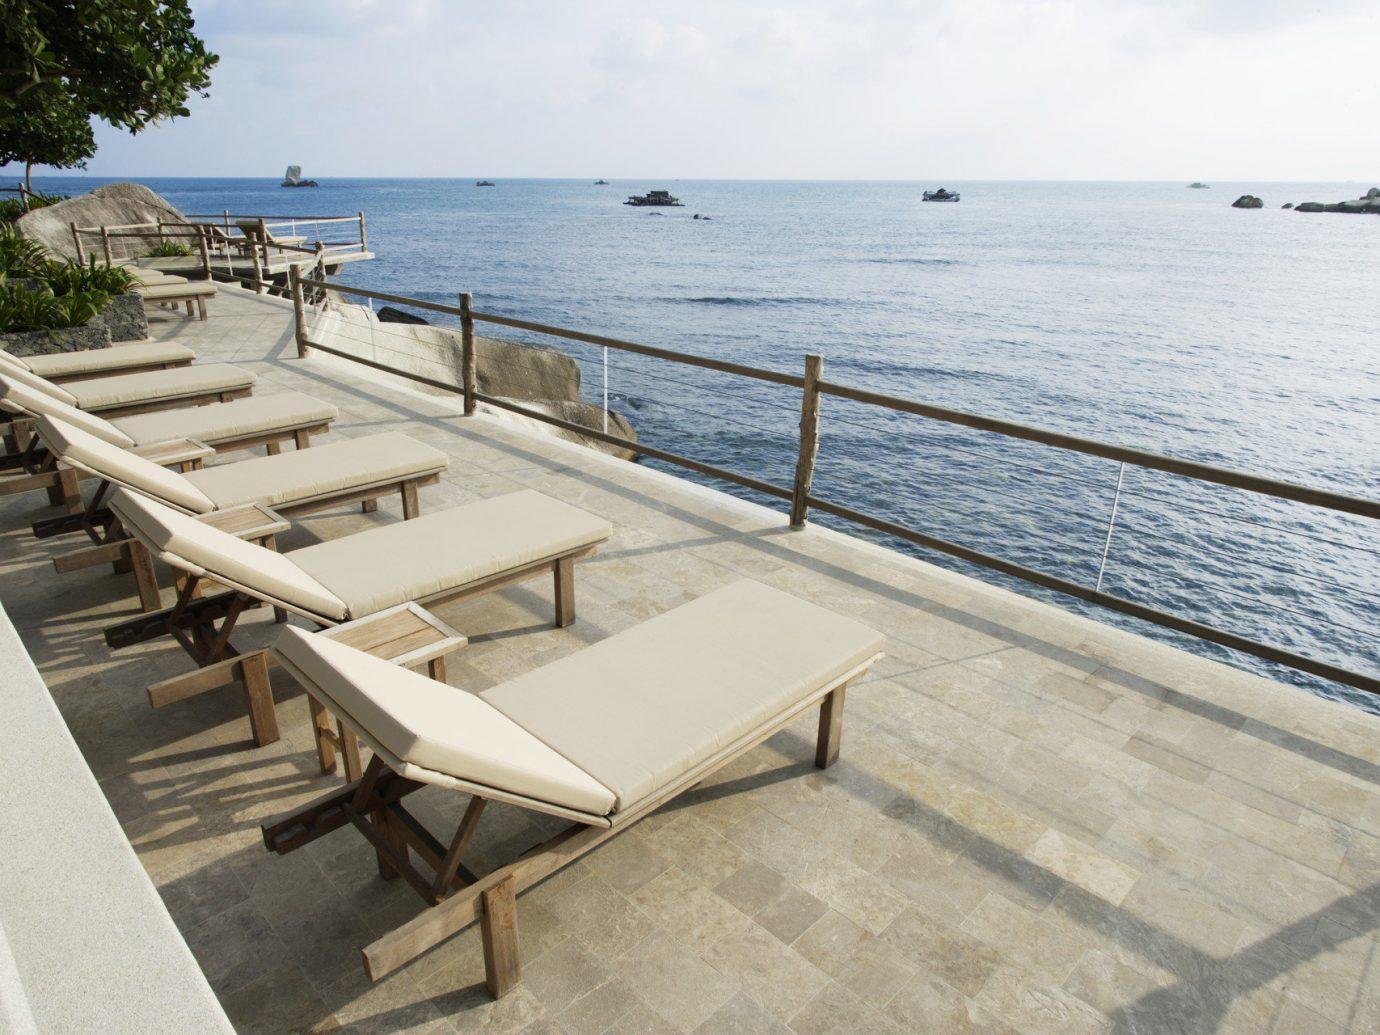 Hotels Luxury Travel sky outdoor water walkway dock Beach Sea shore vacation park Coast Ocean wood boardwalk furniture Resort marina overlooking Deck lined